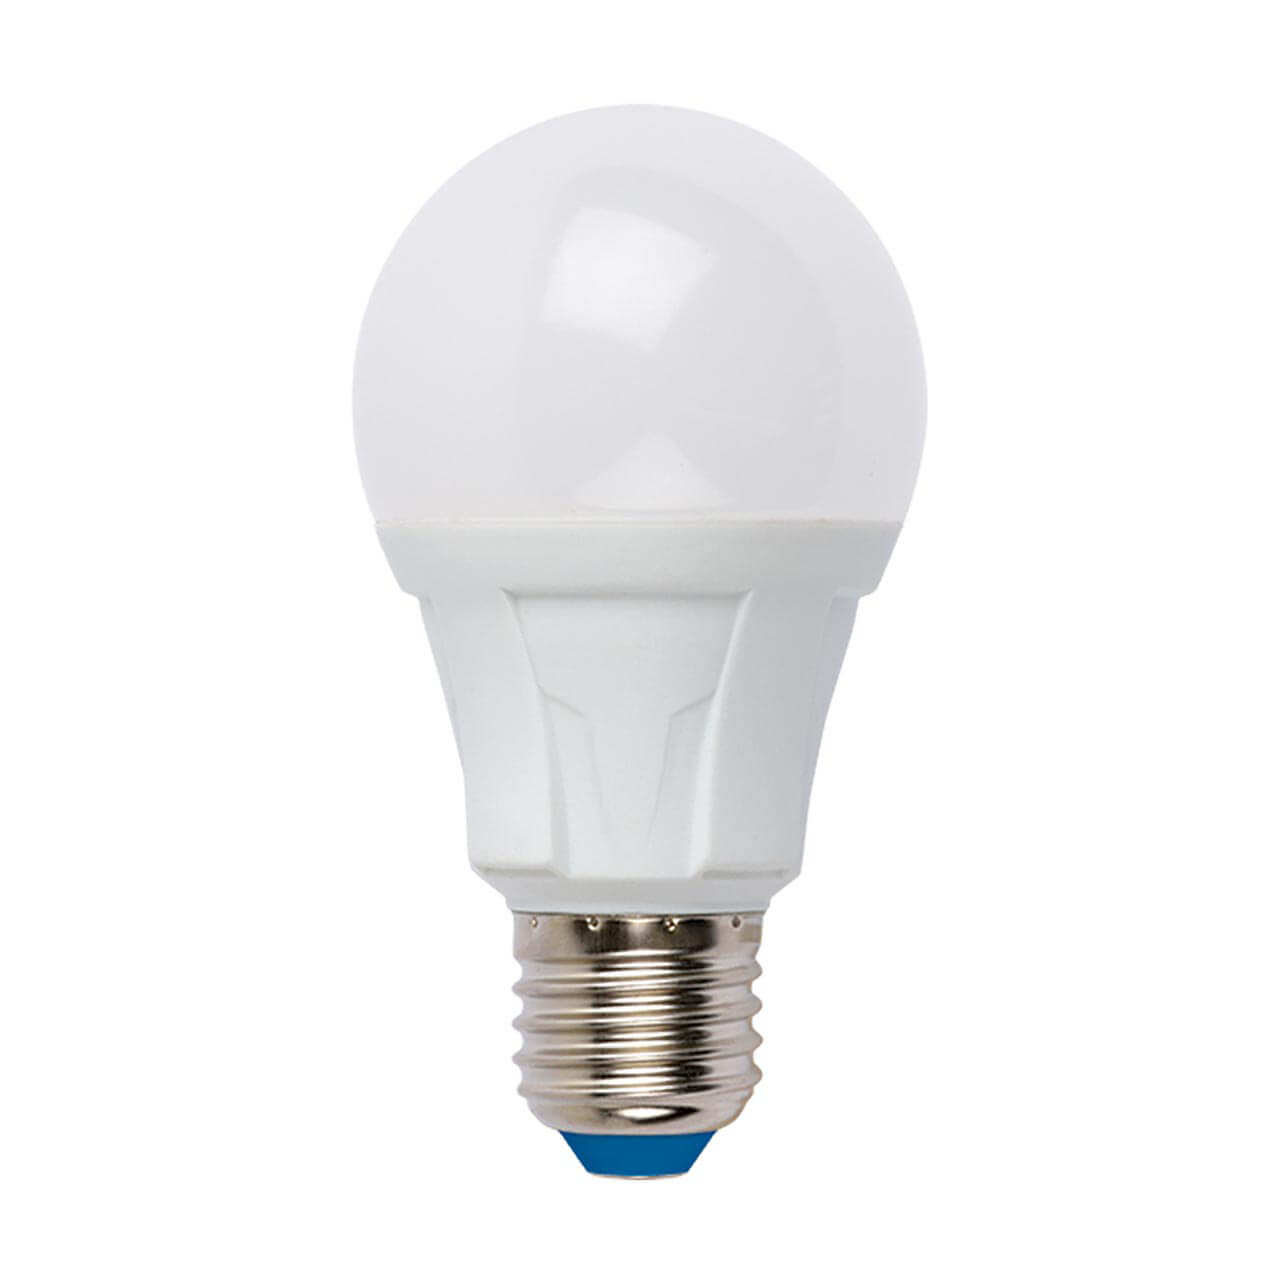 цена Лампочка Uniel LED-A60 13W/4000K/E27/FR PLP01WH Яркая онлайн в 2017 году